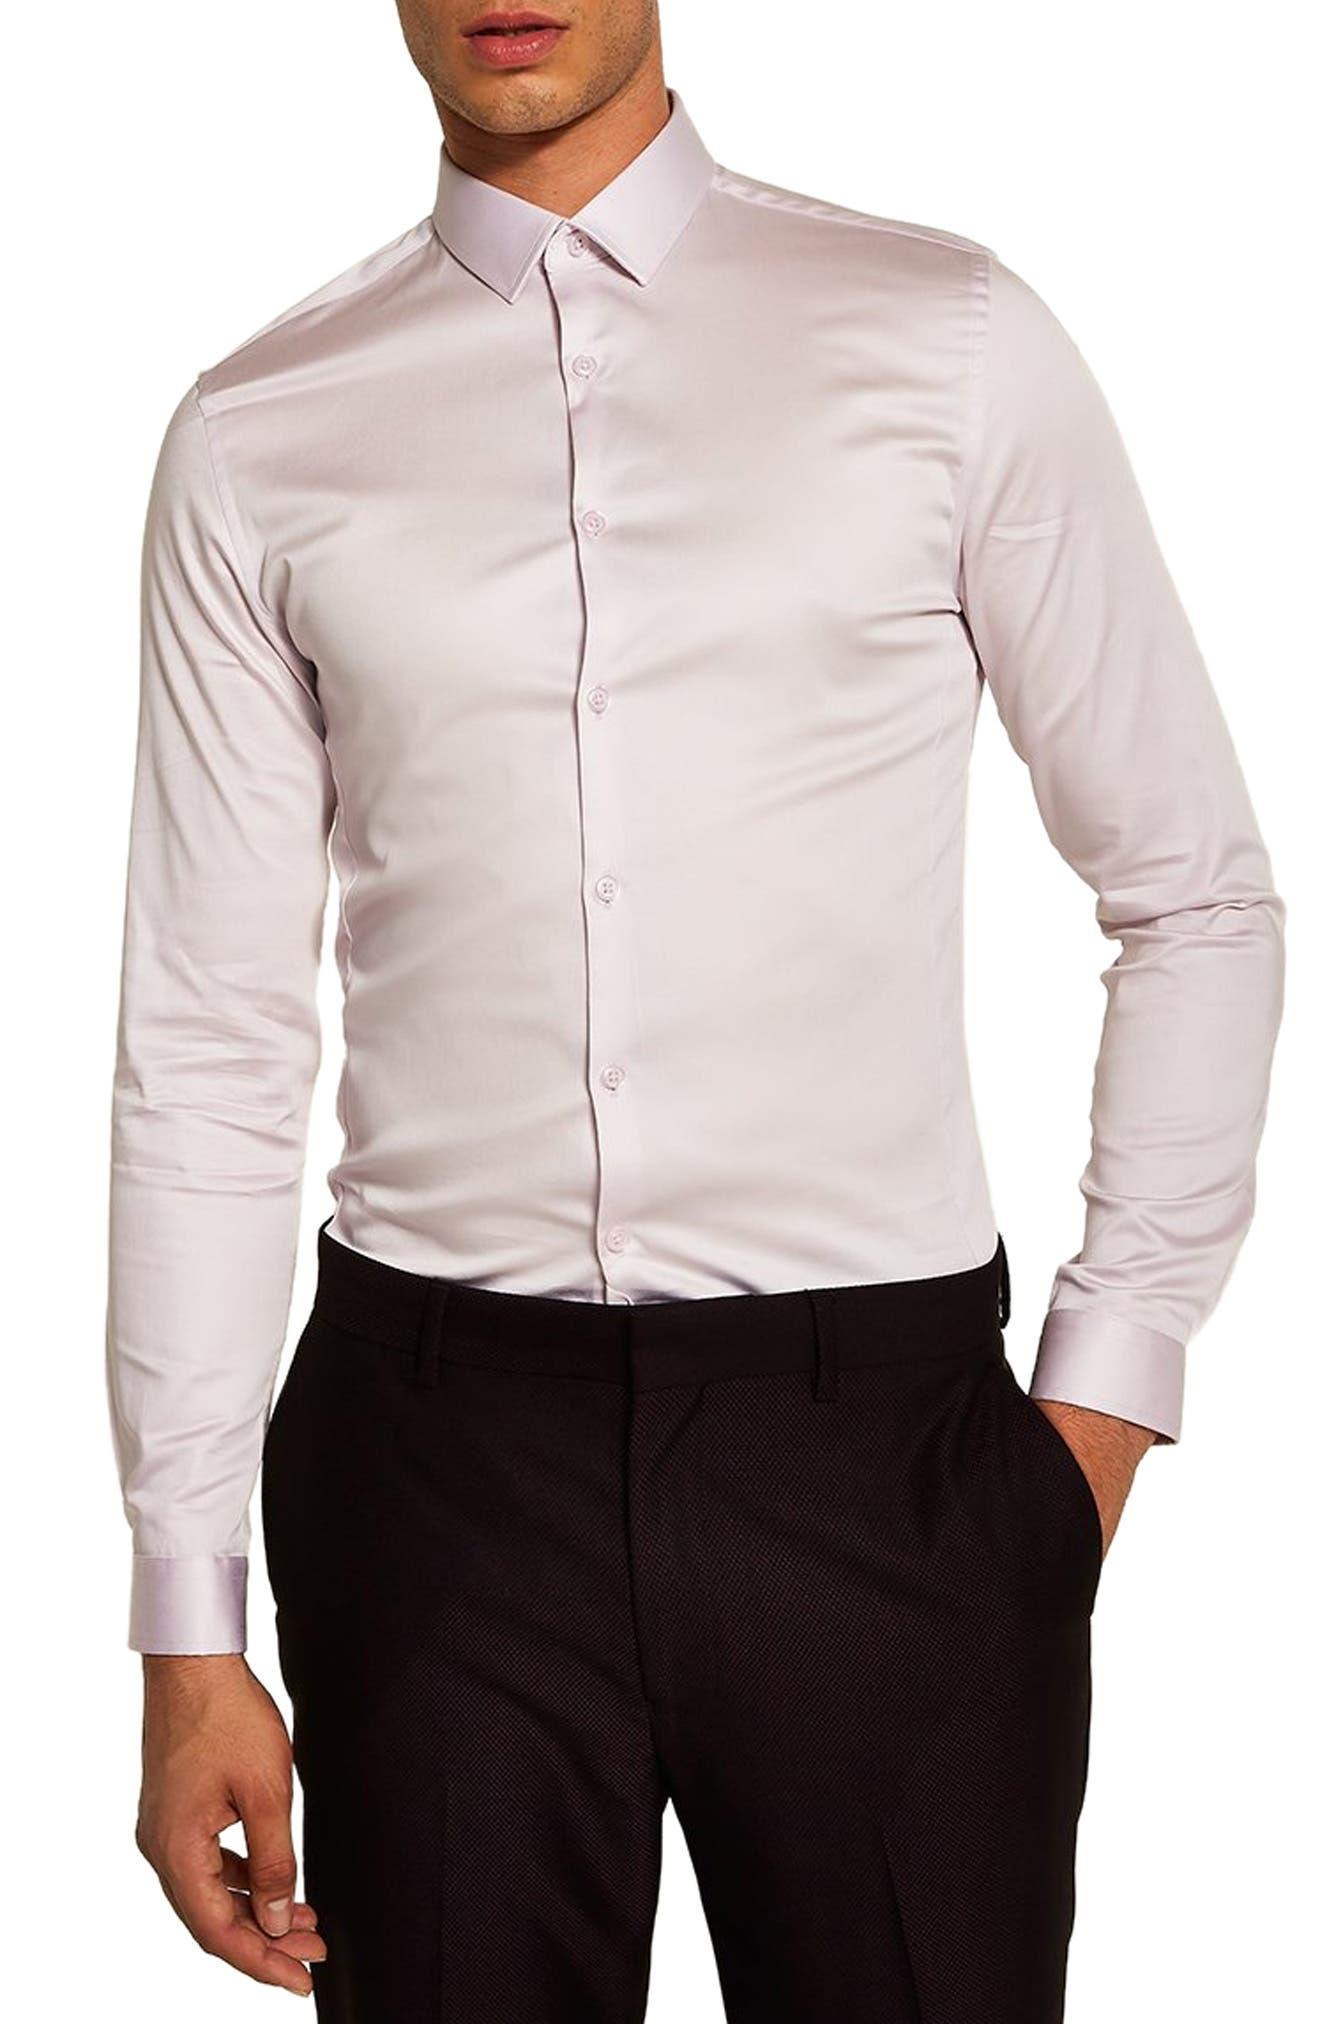 Satin Stretch Classic Fit Shirt,                             Main thumbnail 1, color,                             PURPLE